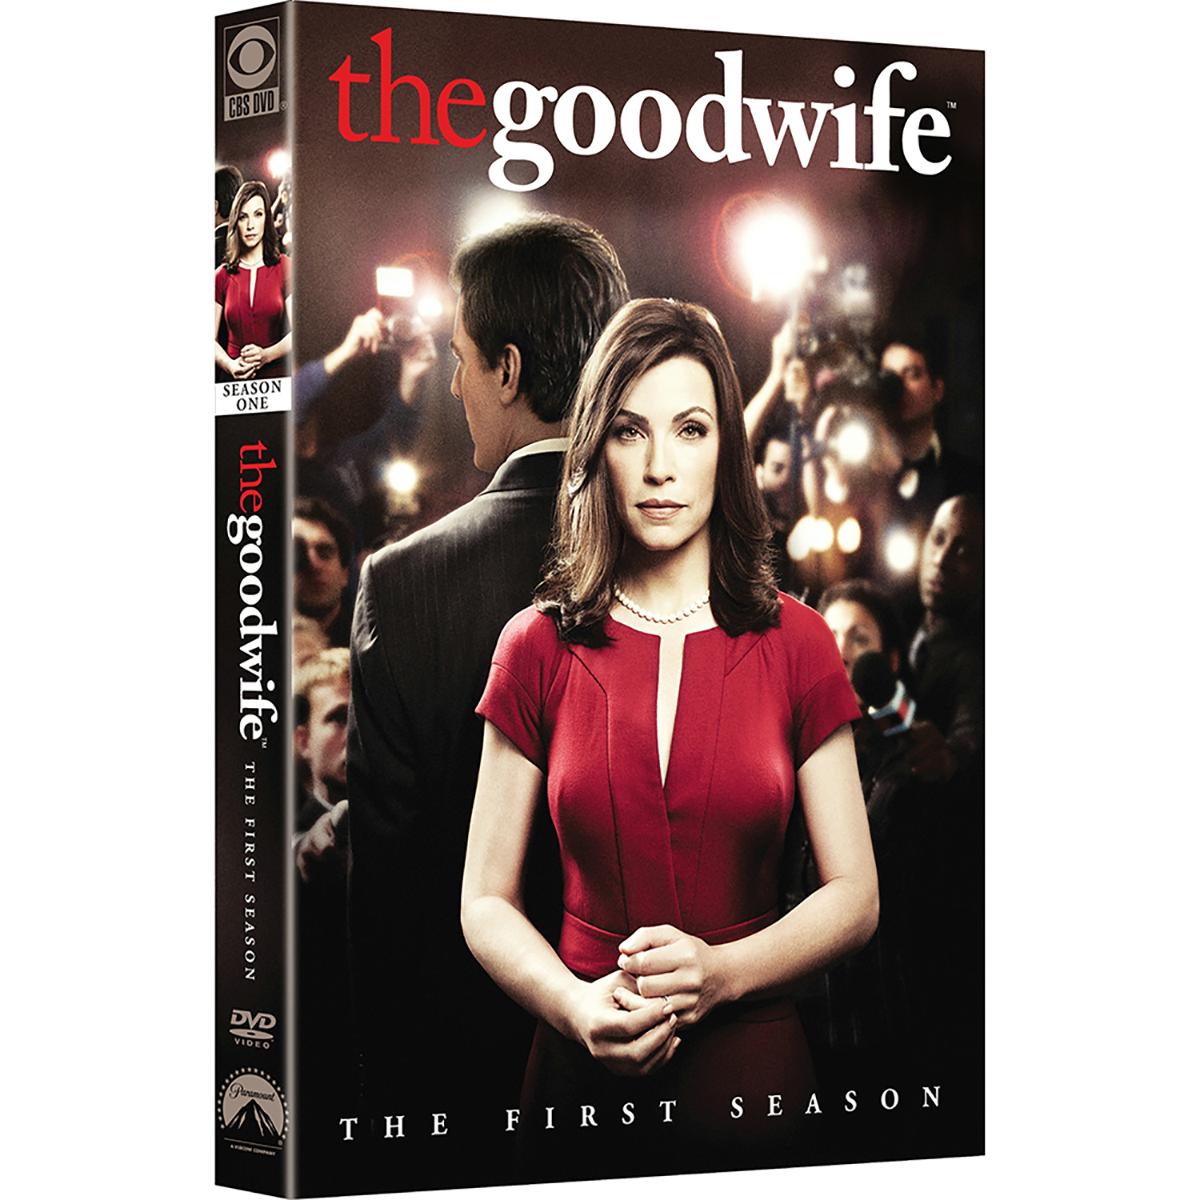 The Good Wife: Season 1 DVD